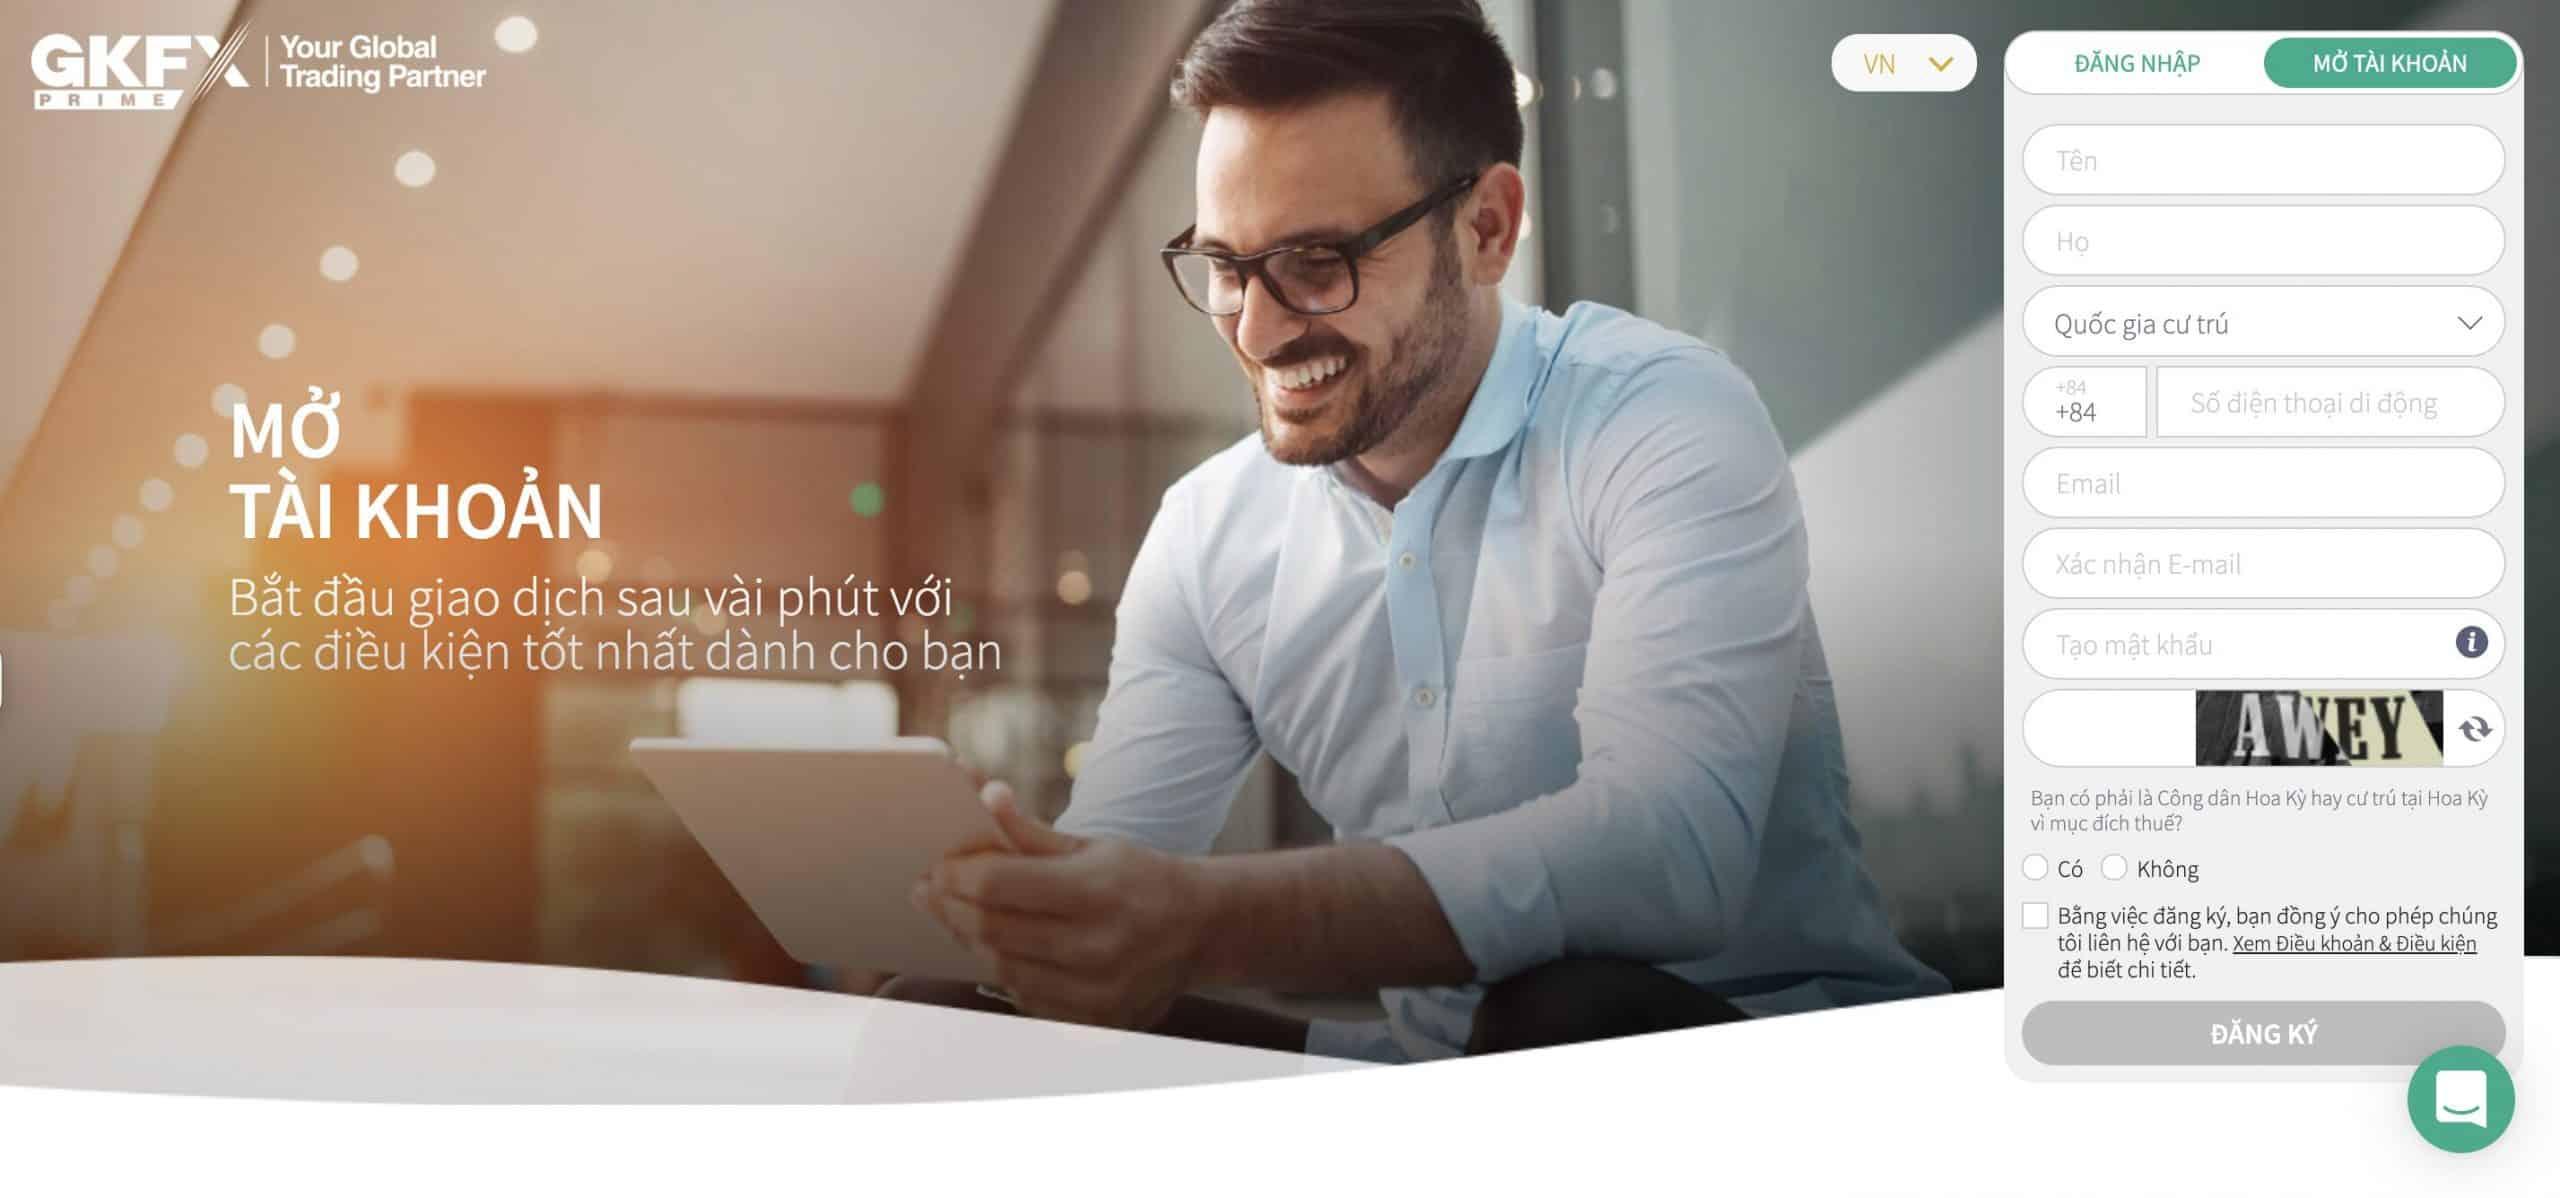 Cách mua cổ phiếu Apple online tại GKFX Prime - Topbrokervn.com